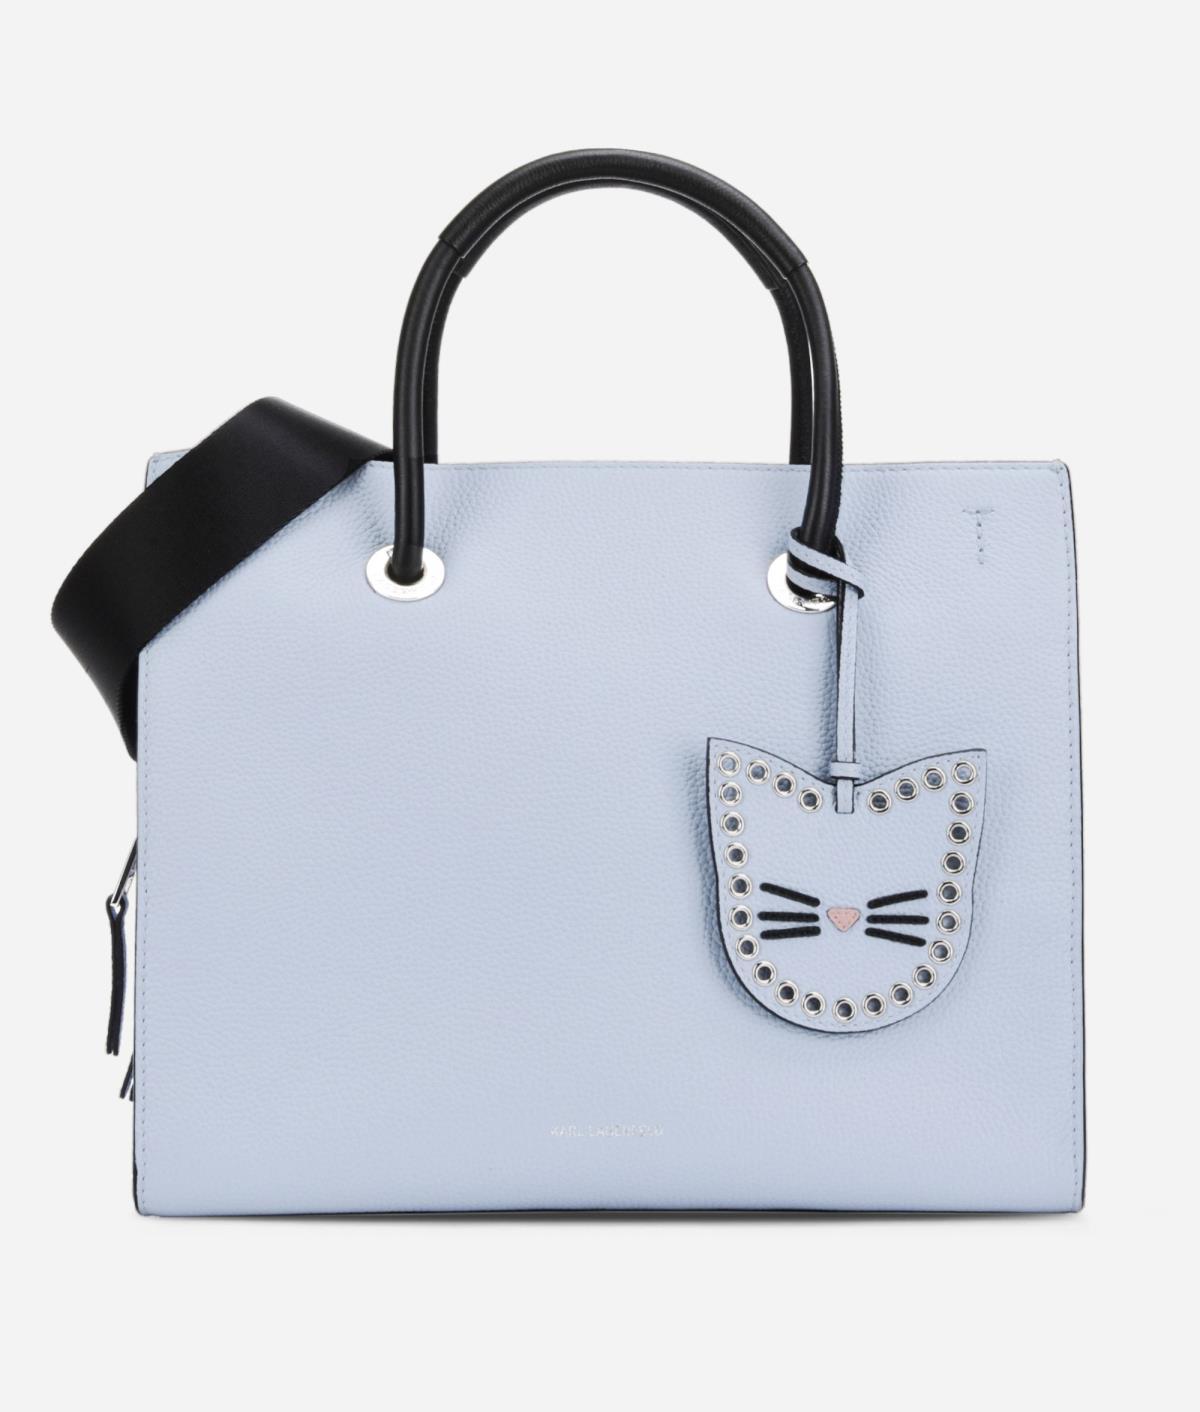 Karl Lagerfeld Bag 81kw3104 Martucciboutiquecom